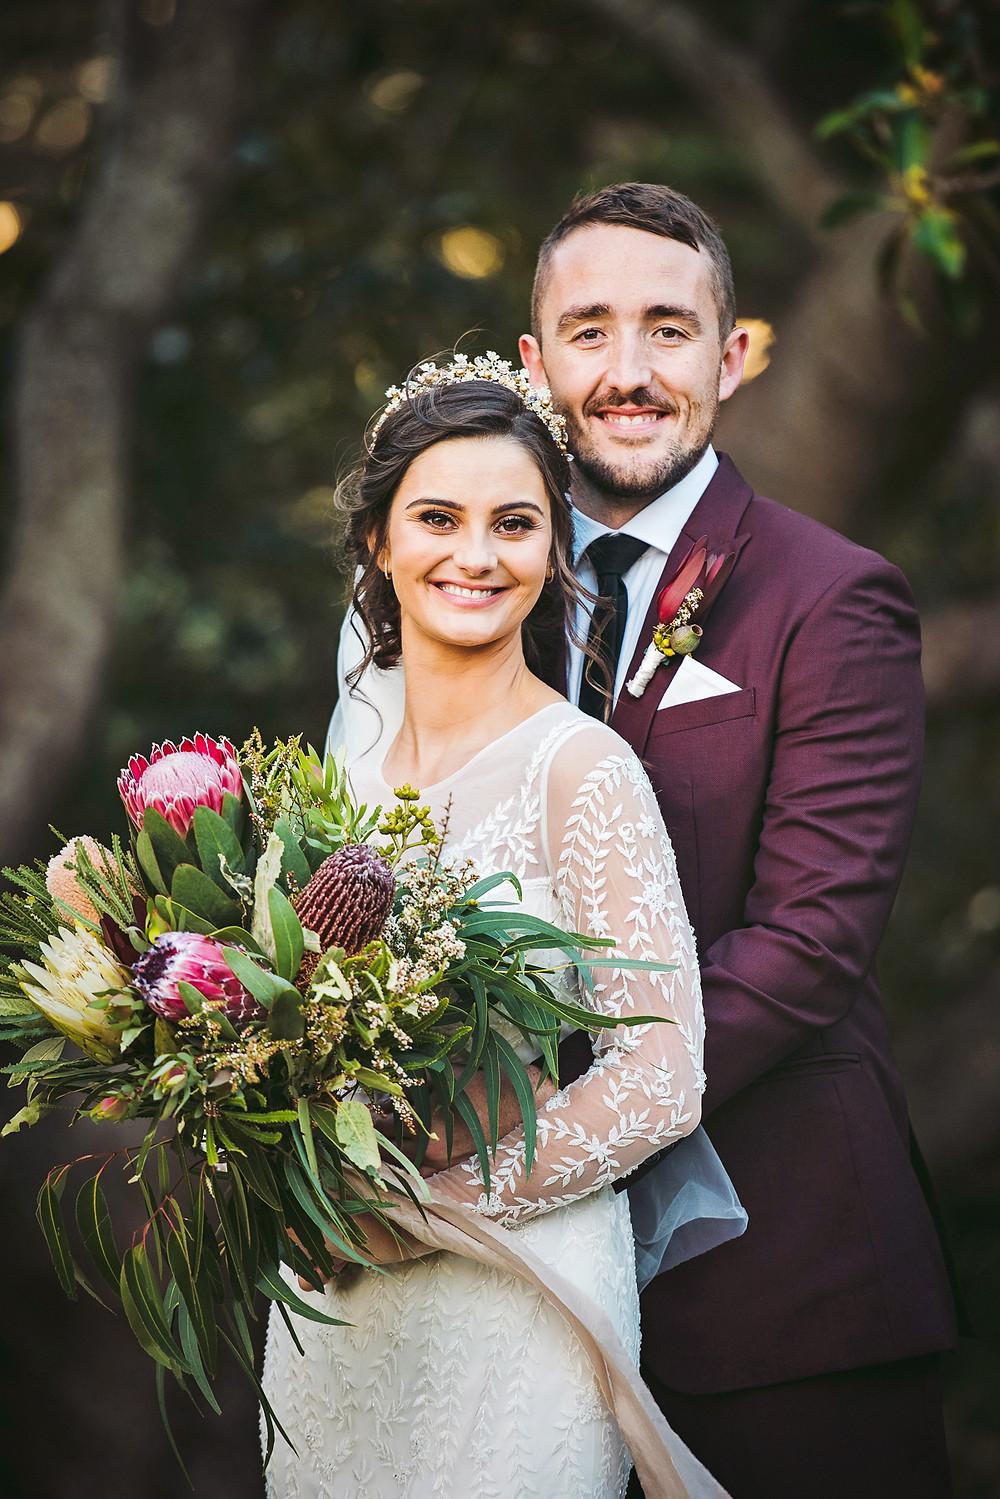    manly wedding, bride and groom, cardinal cerruti chapel, wedding dress, wedding flowers